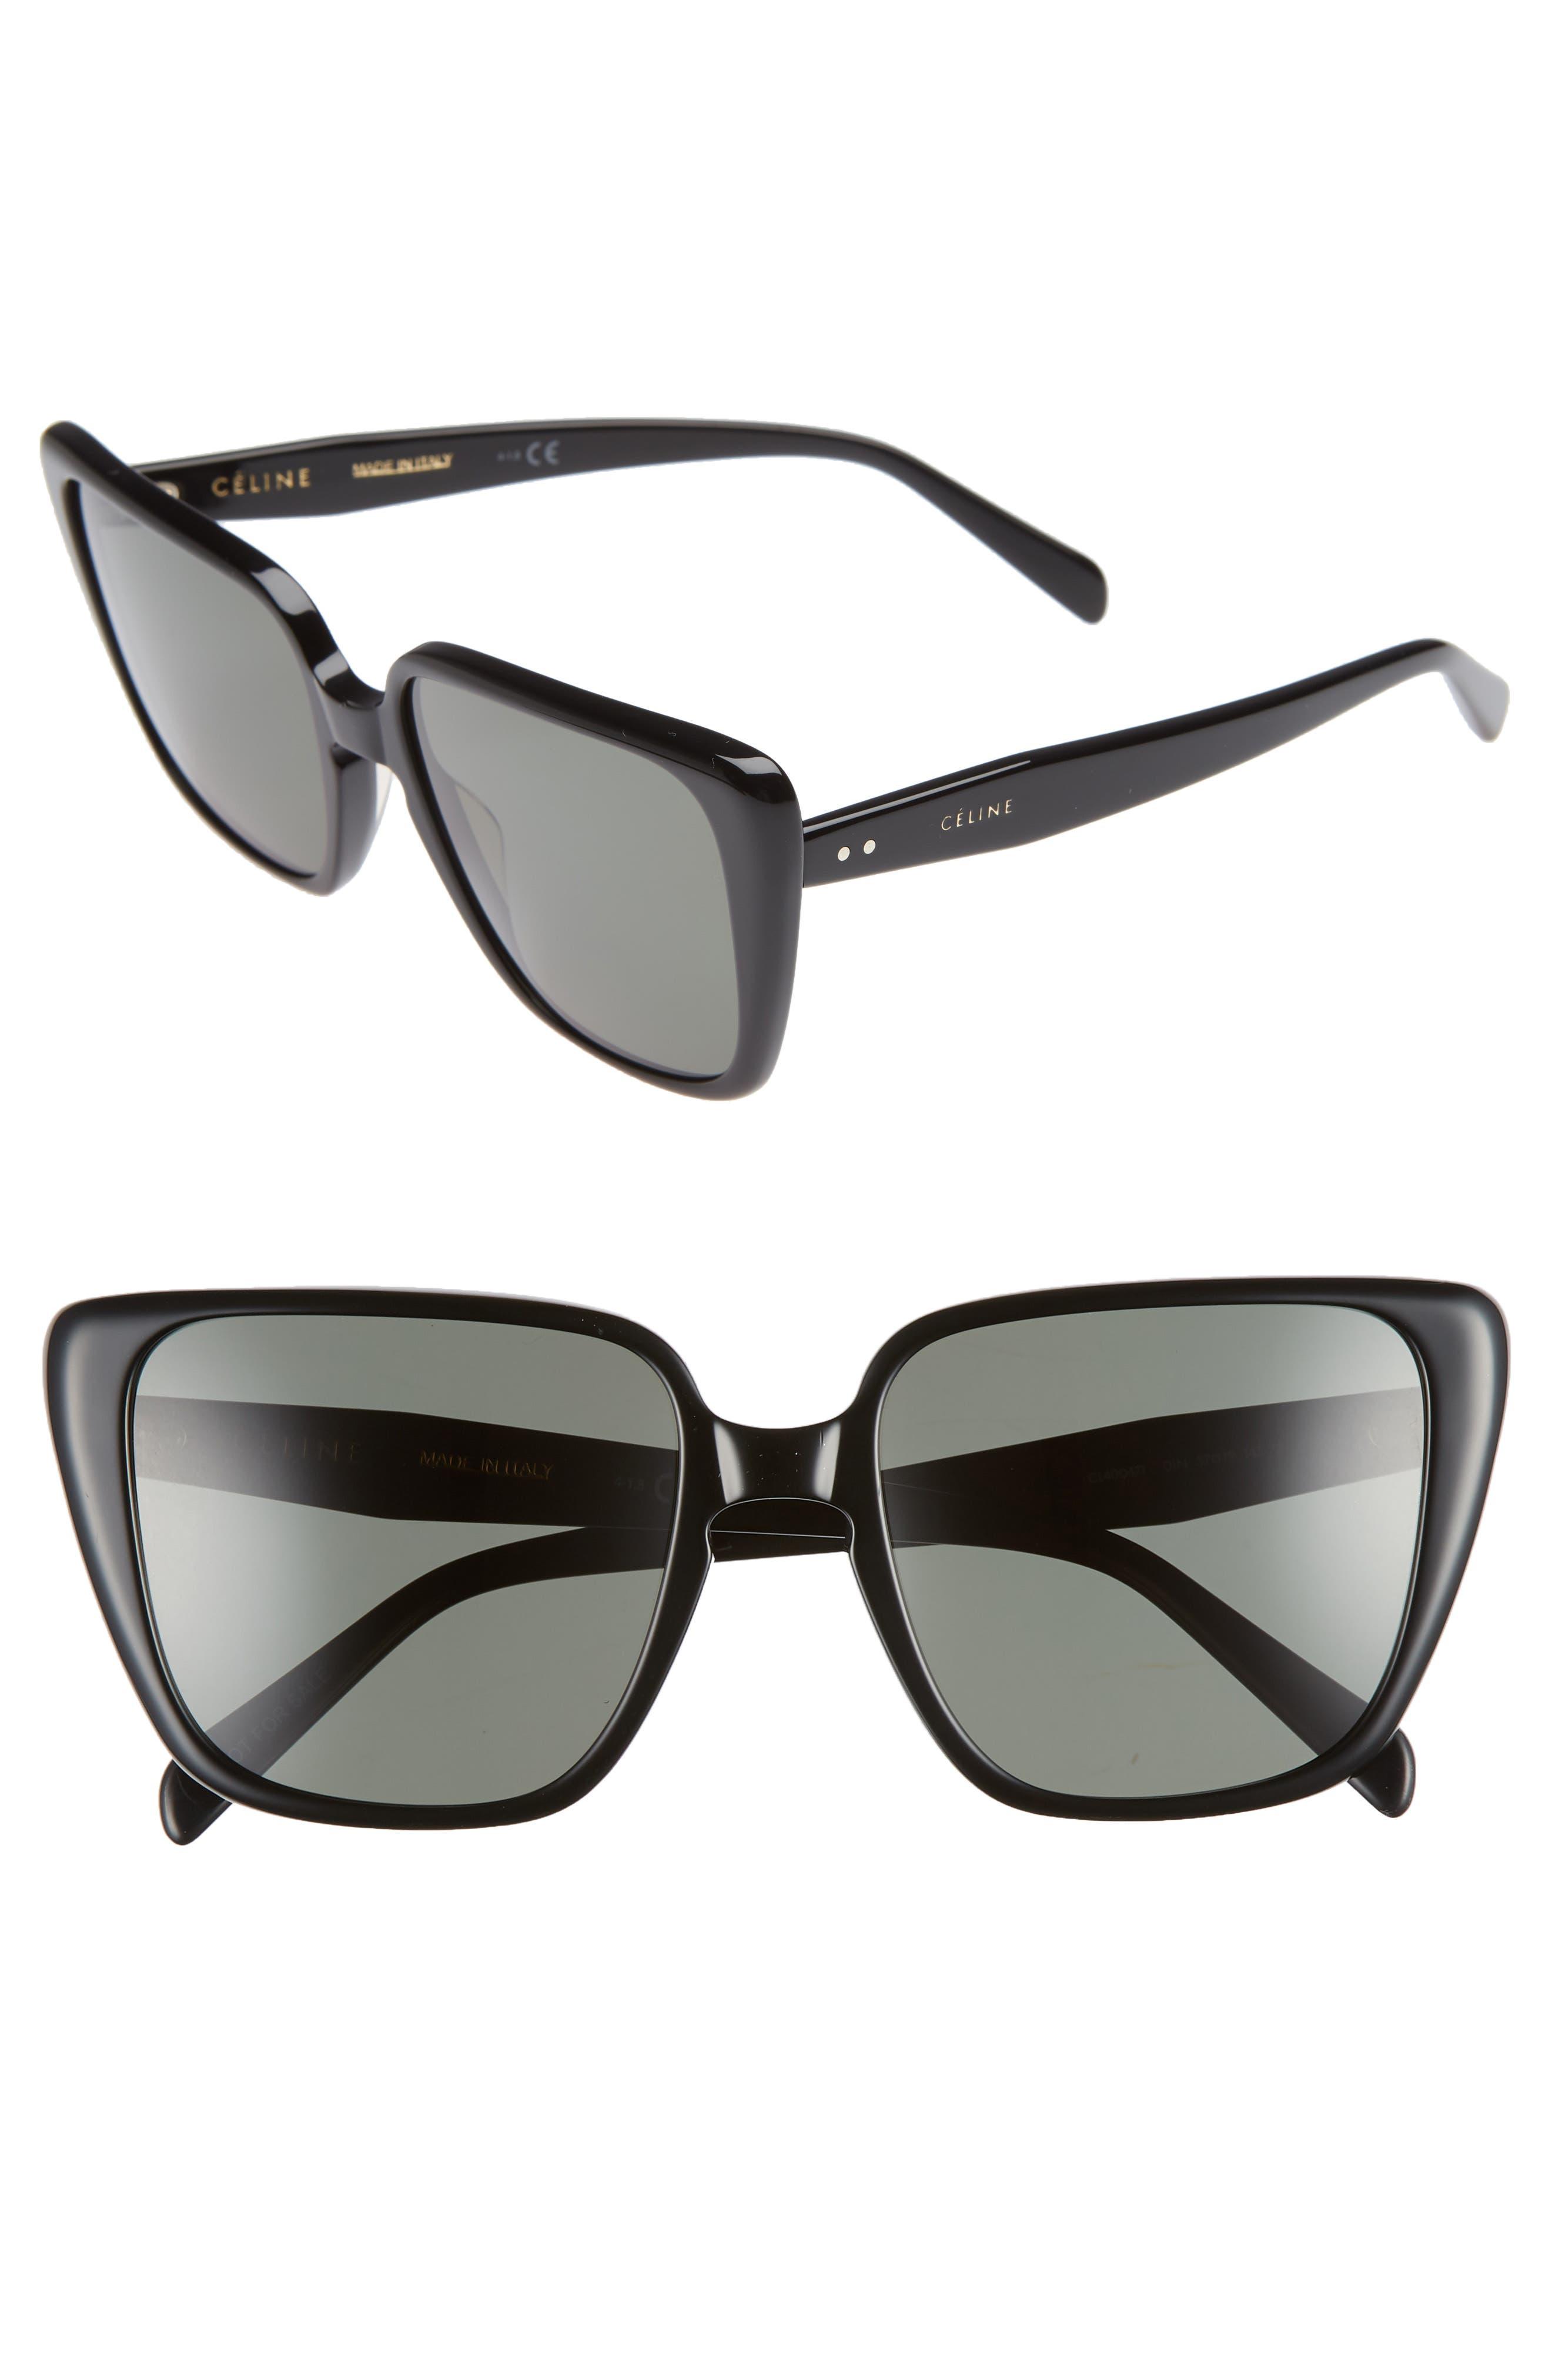 57Mm Modified Square Cat Eye Sunglasses - Black